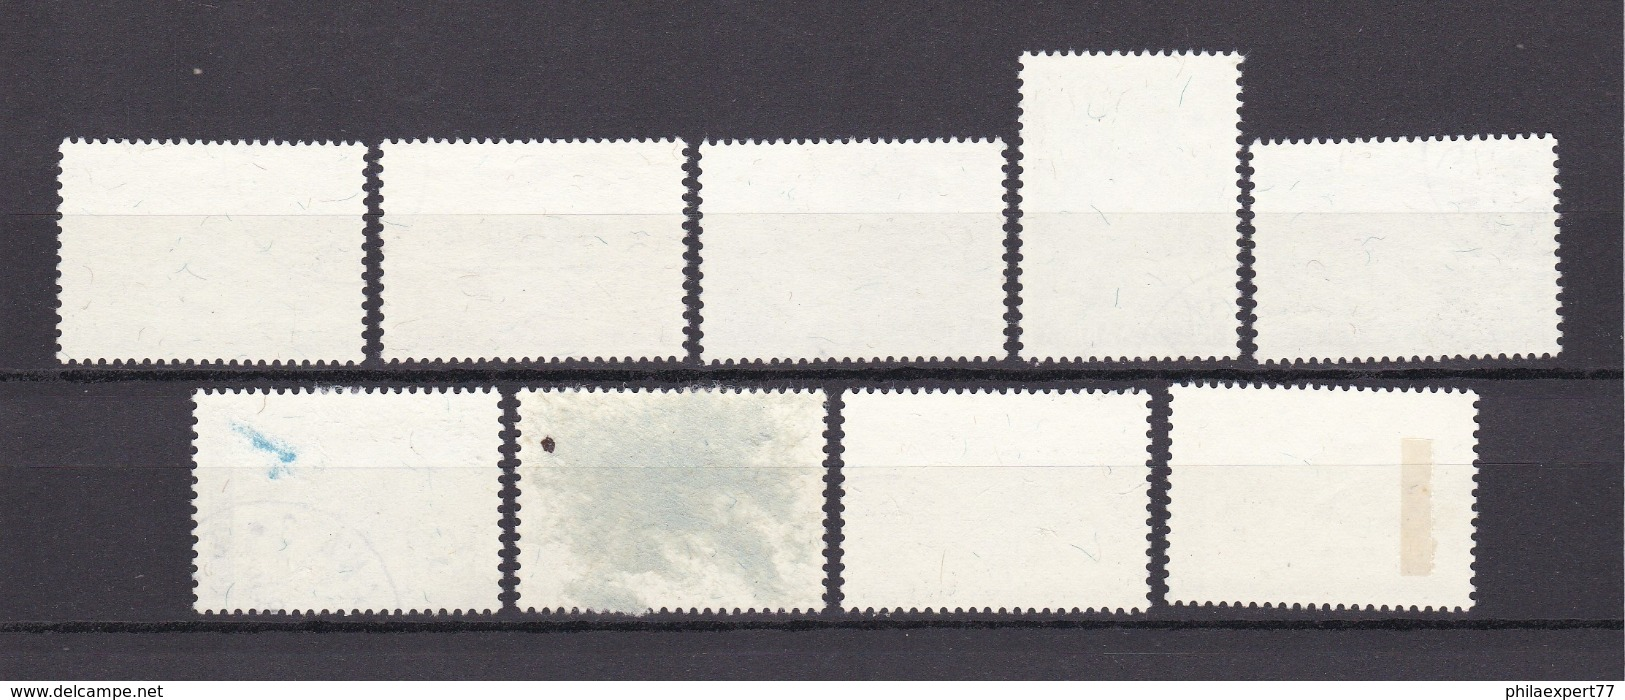 Jugoslawien - 1958 - Michel Nr. 842/850 - Gest. - 20 Euro - Gebraucht